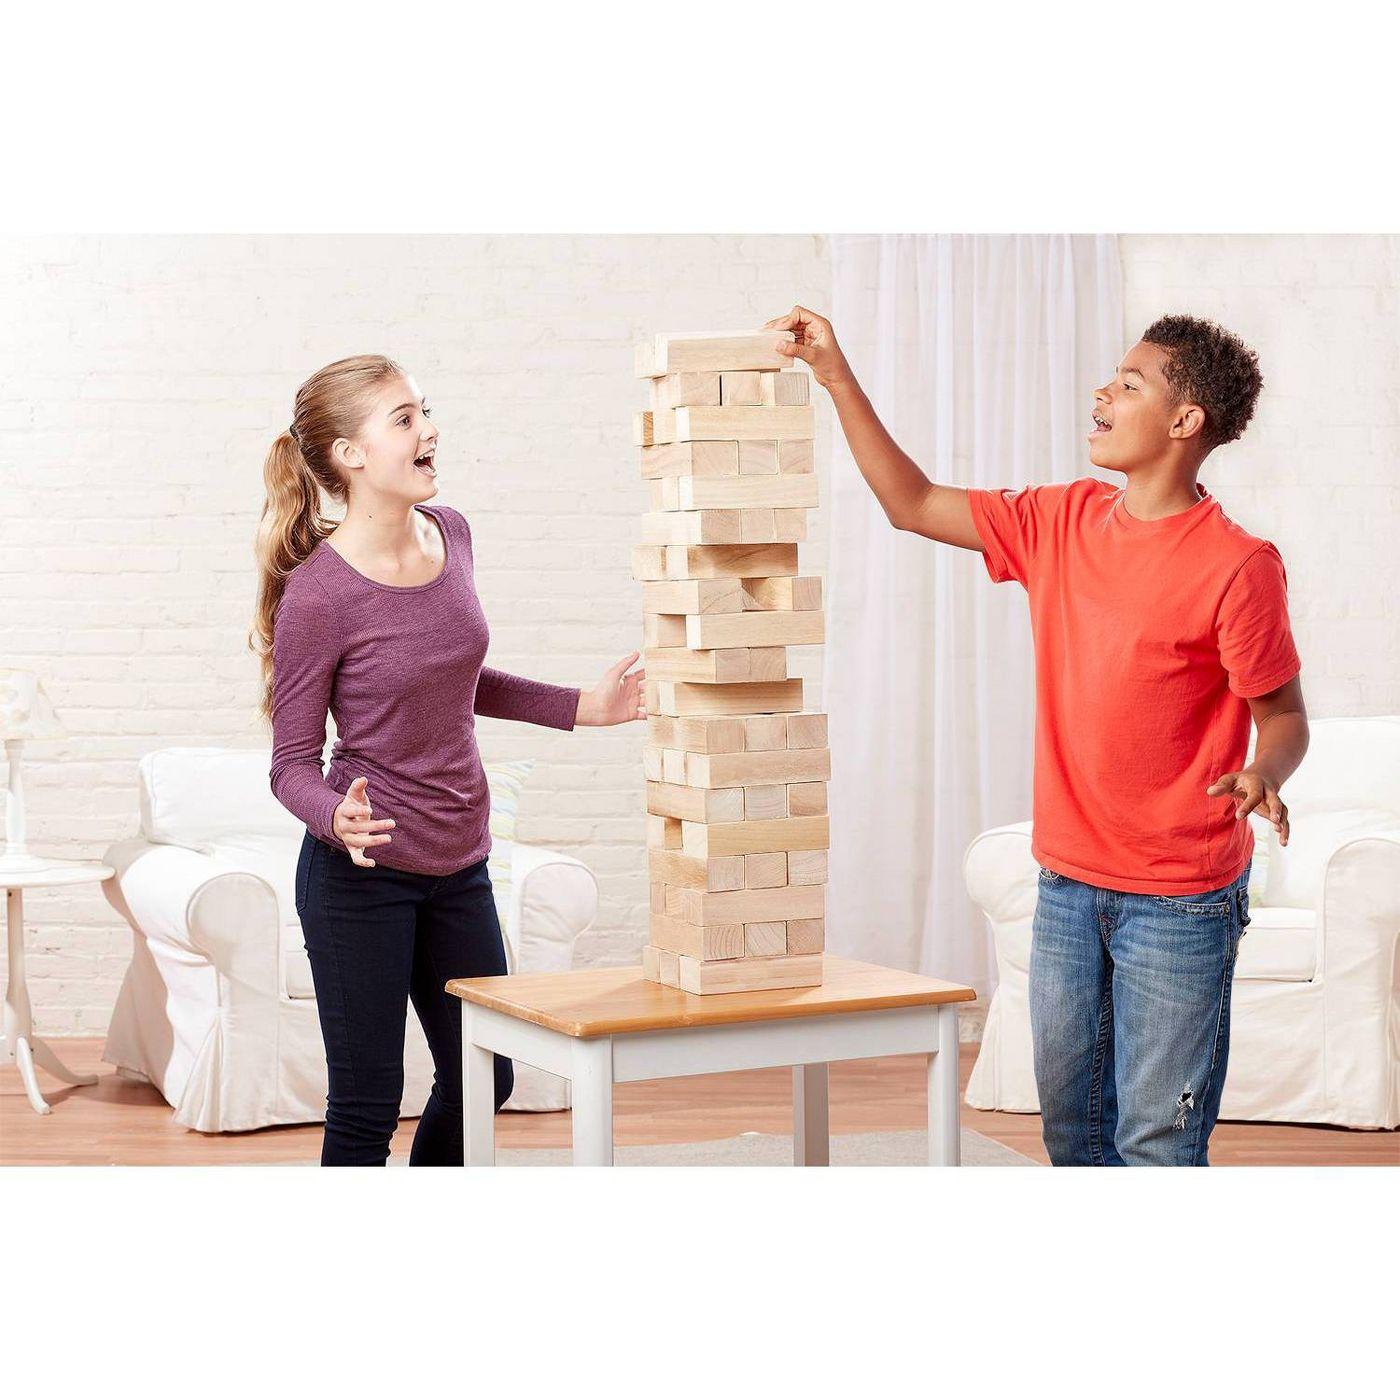 Cardinal Giant Jumbling Tower Game - image 3 of 4